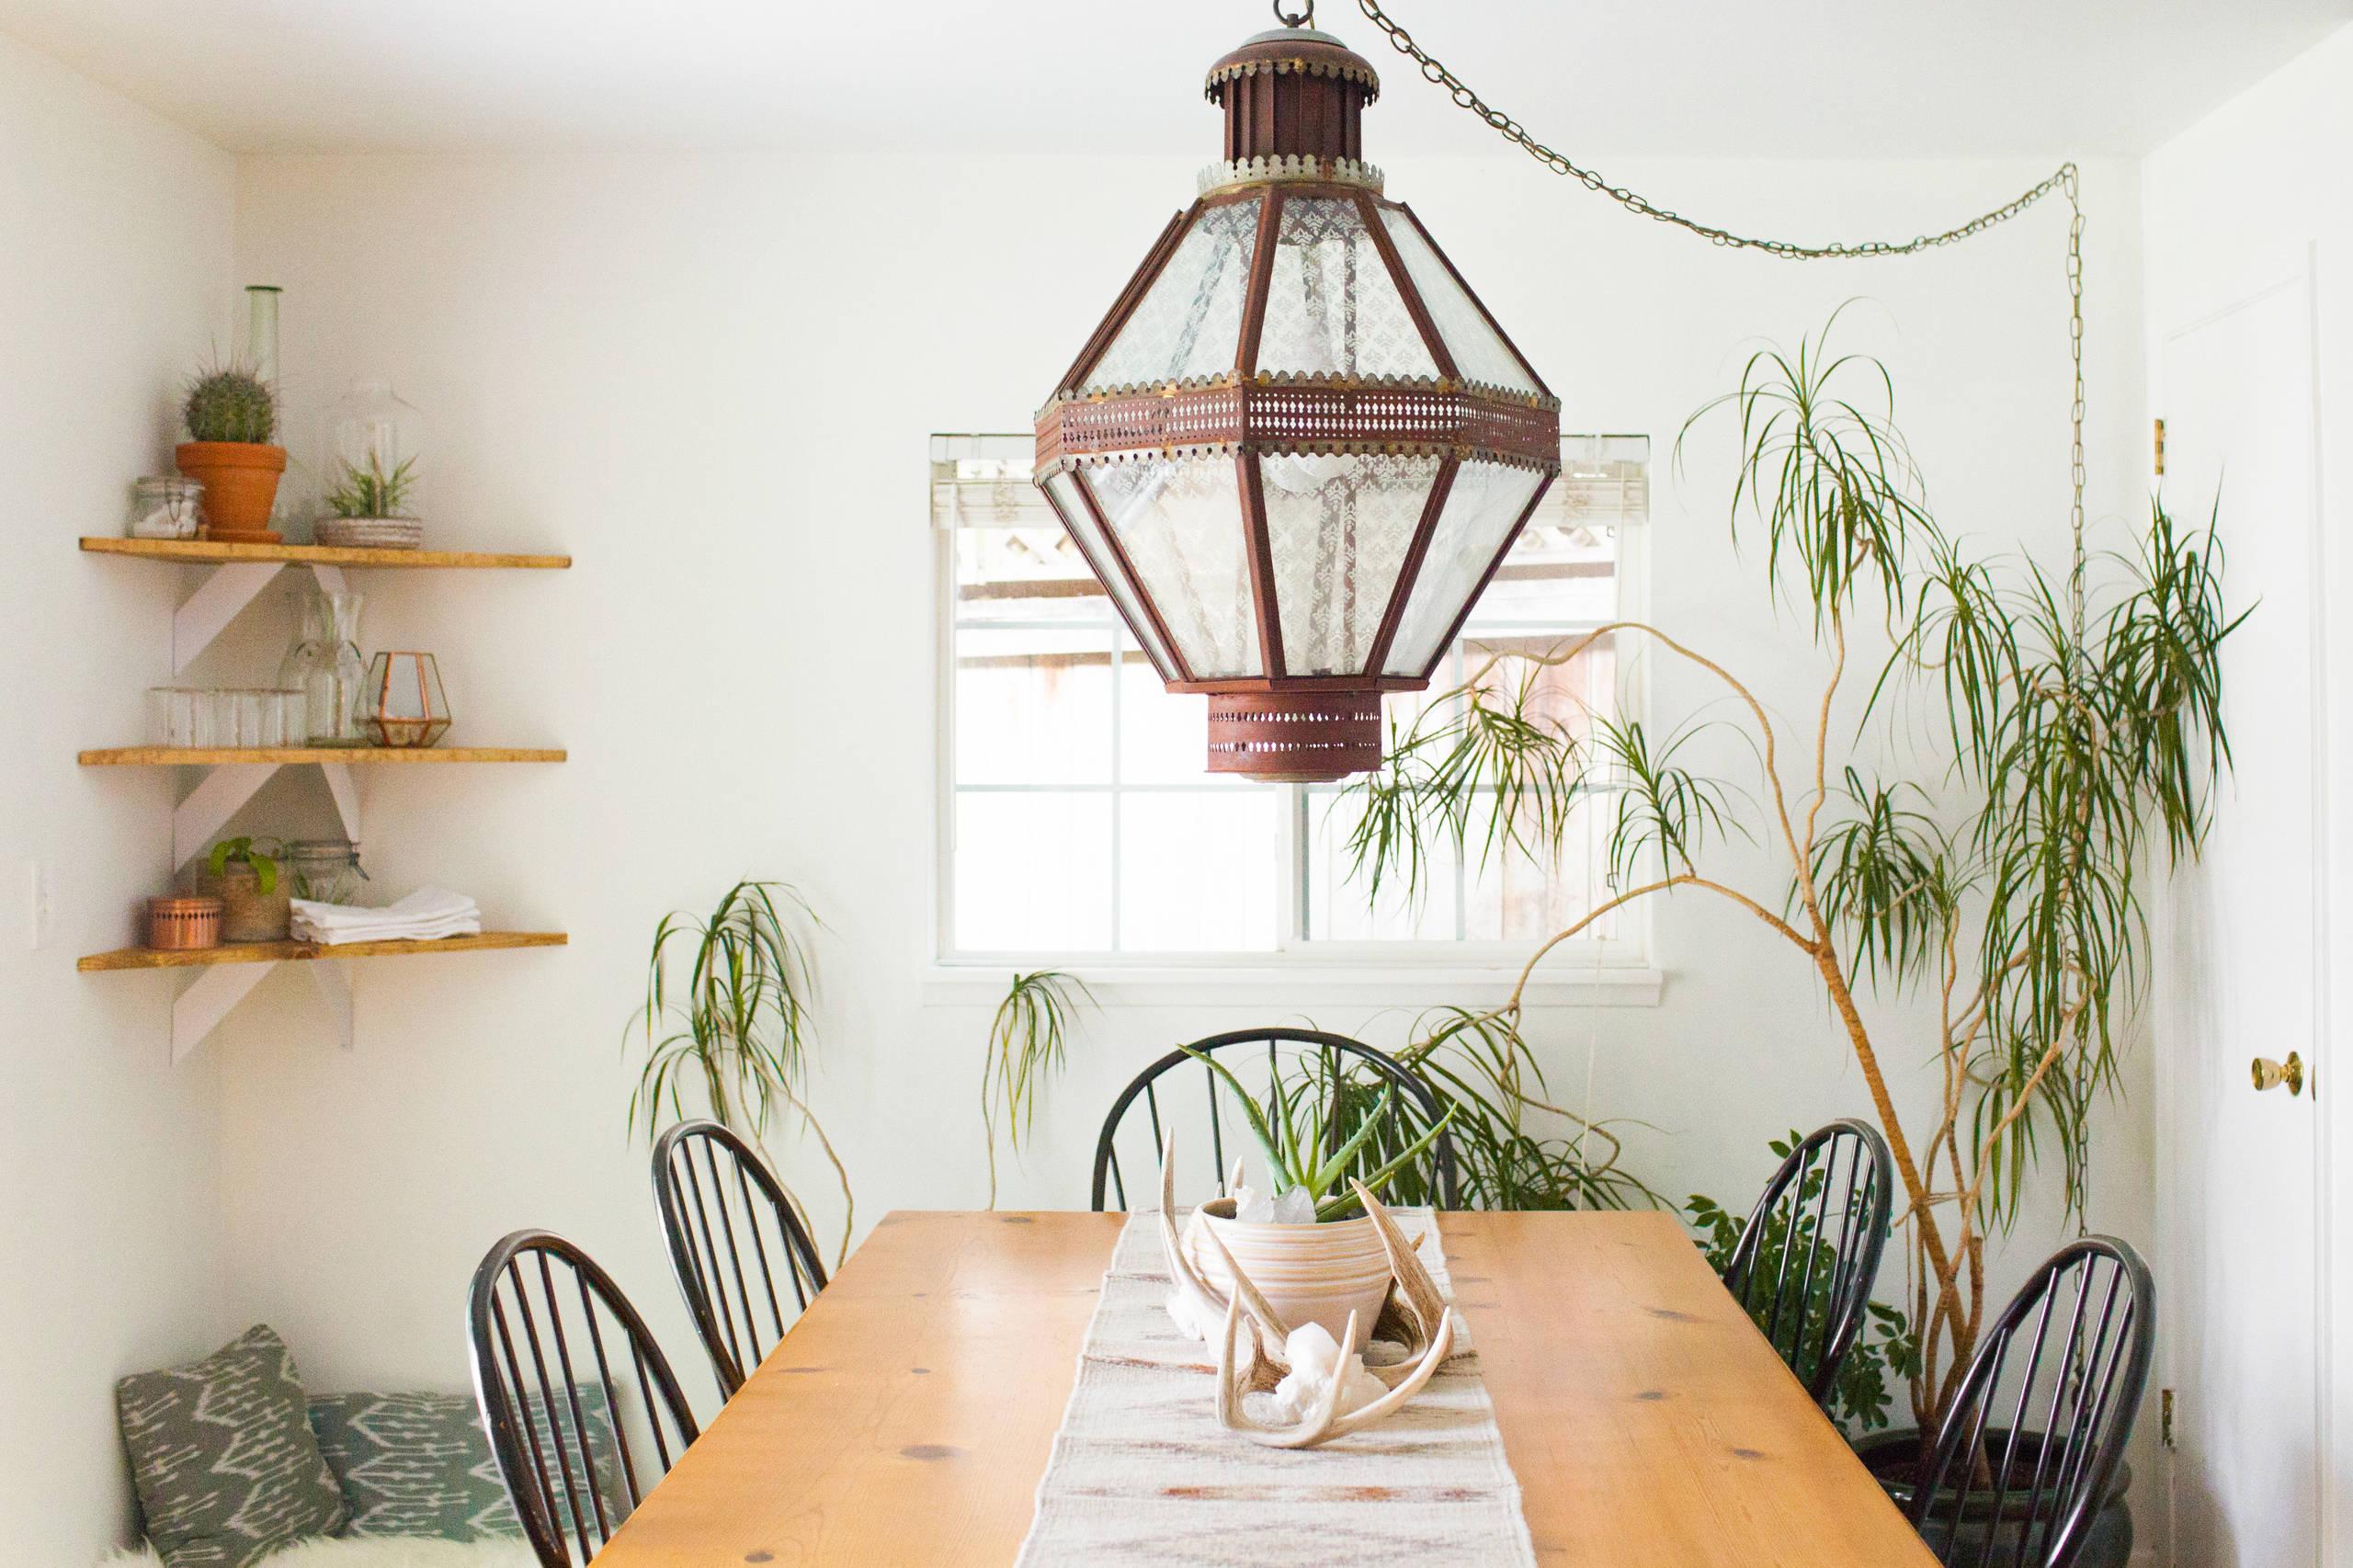 Bohemian Dining Room Ideas Photos Houzz, Bohemian Style Dining Room